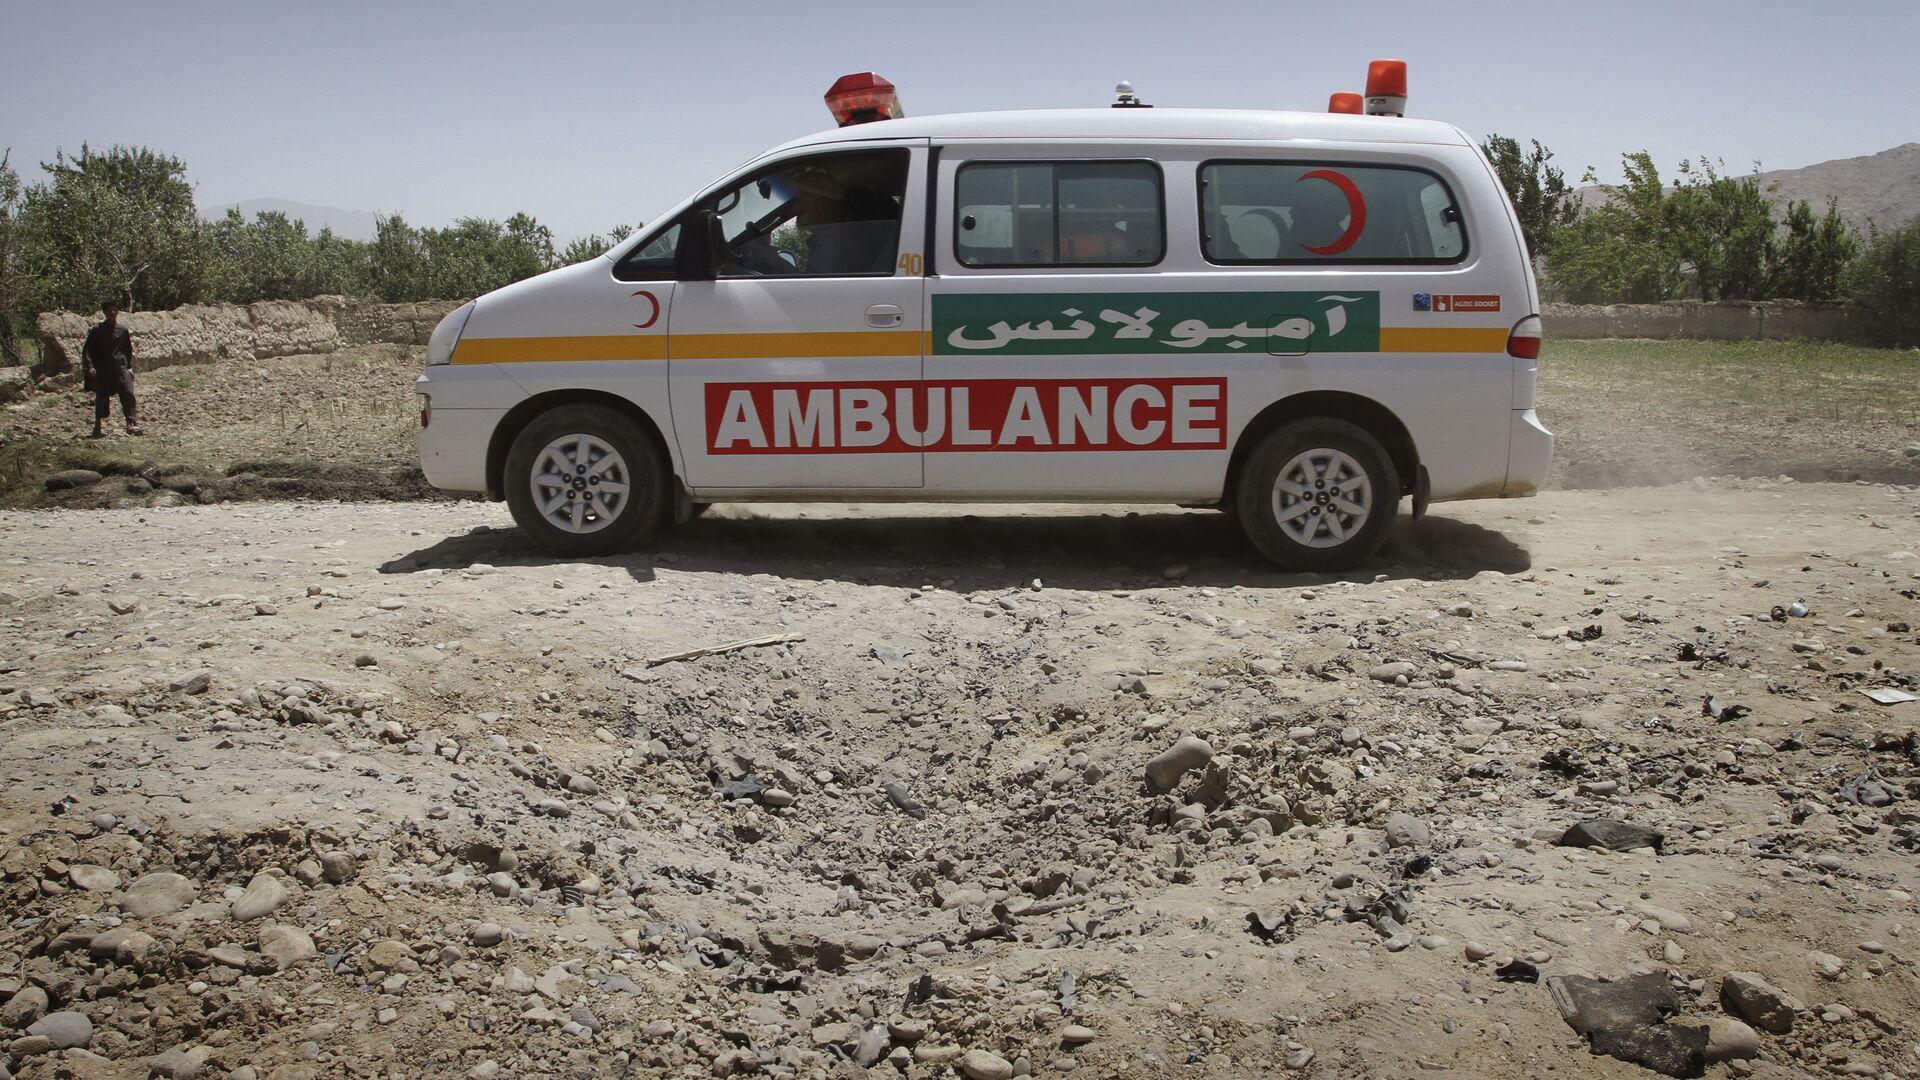 Ambulanza in Afghanistan - Sputnik Italia, 1920, 29.07.2021